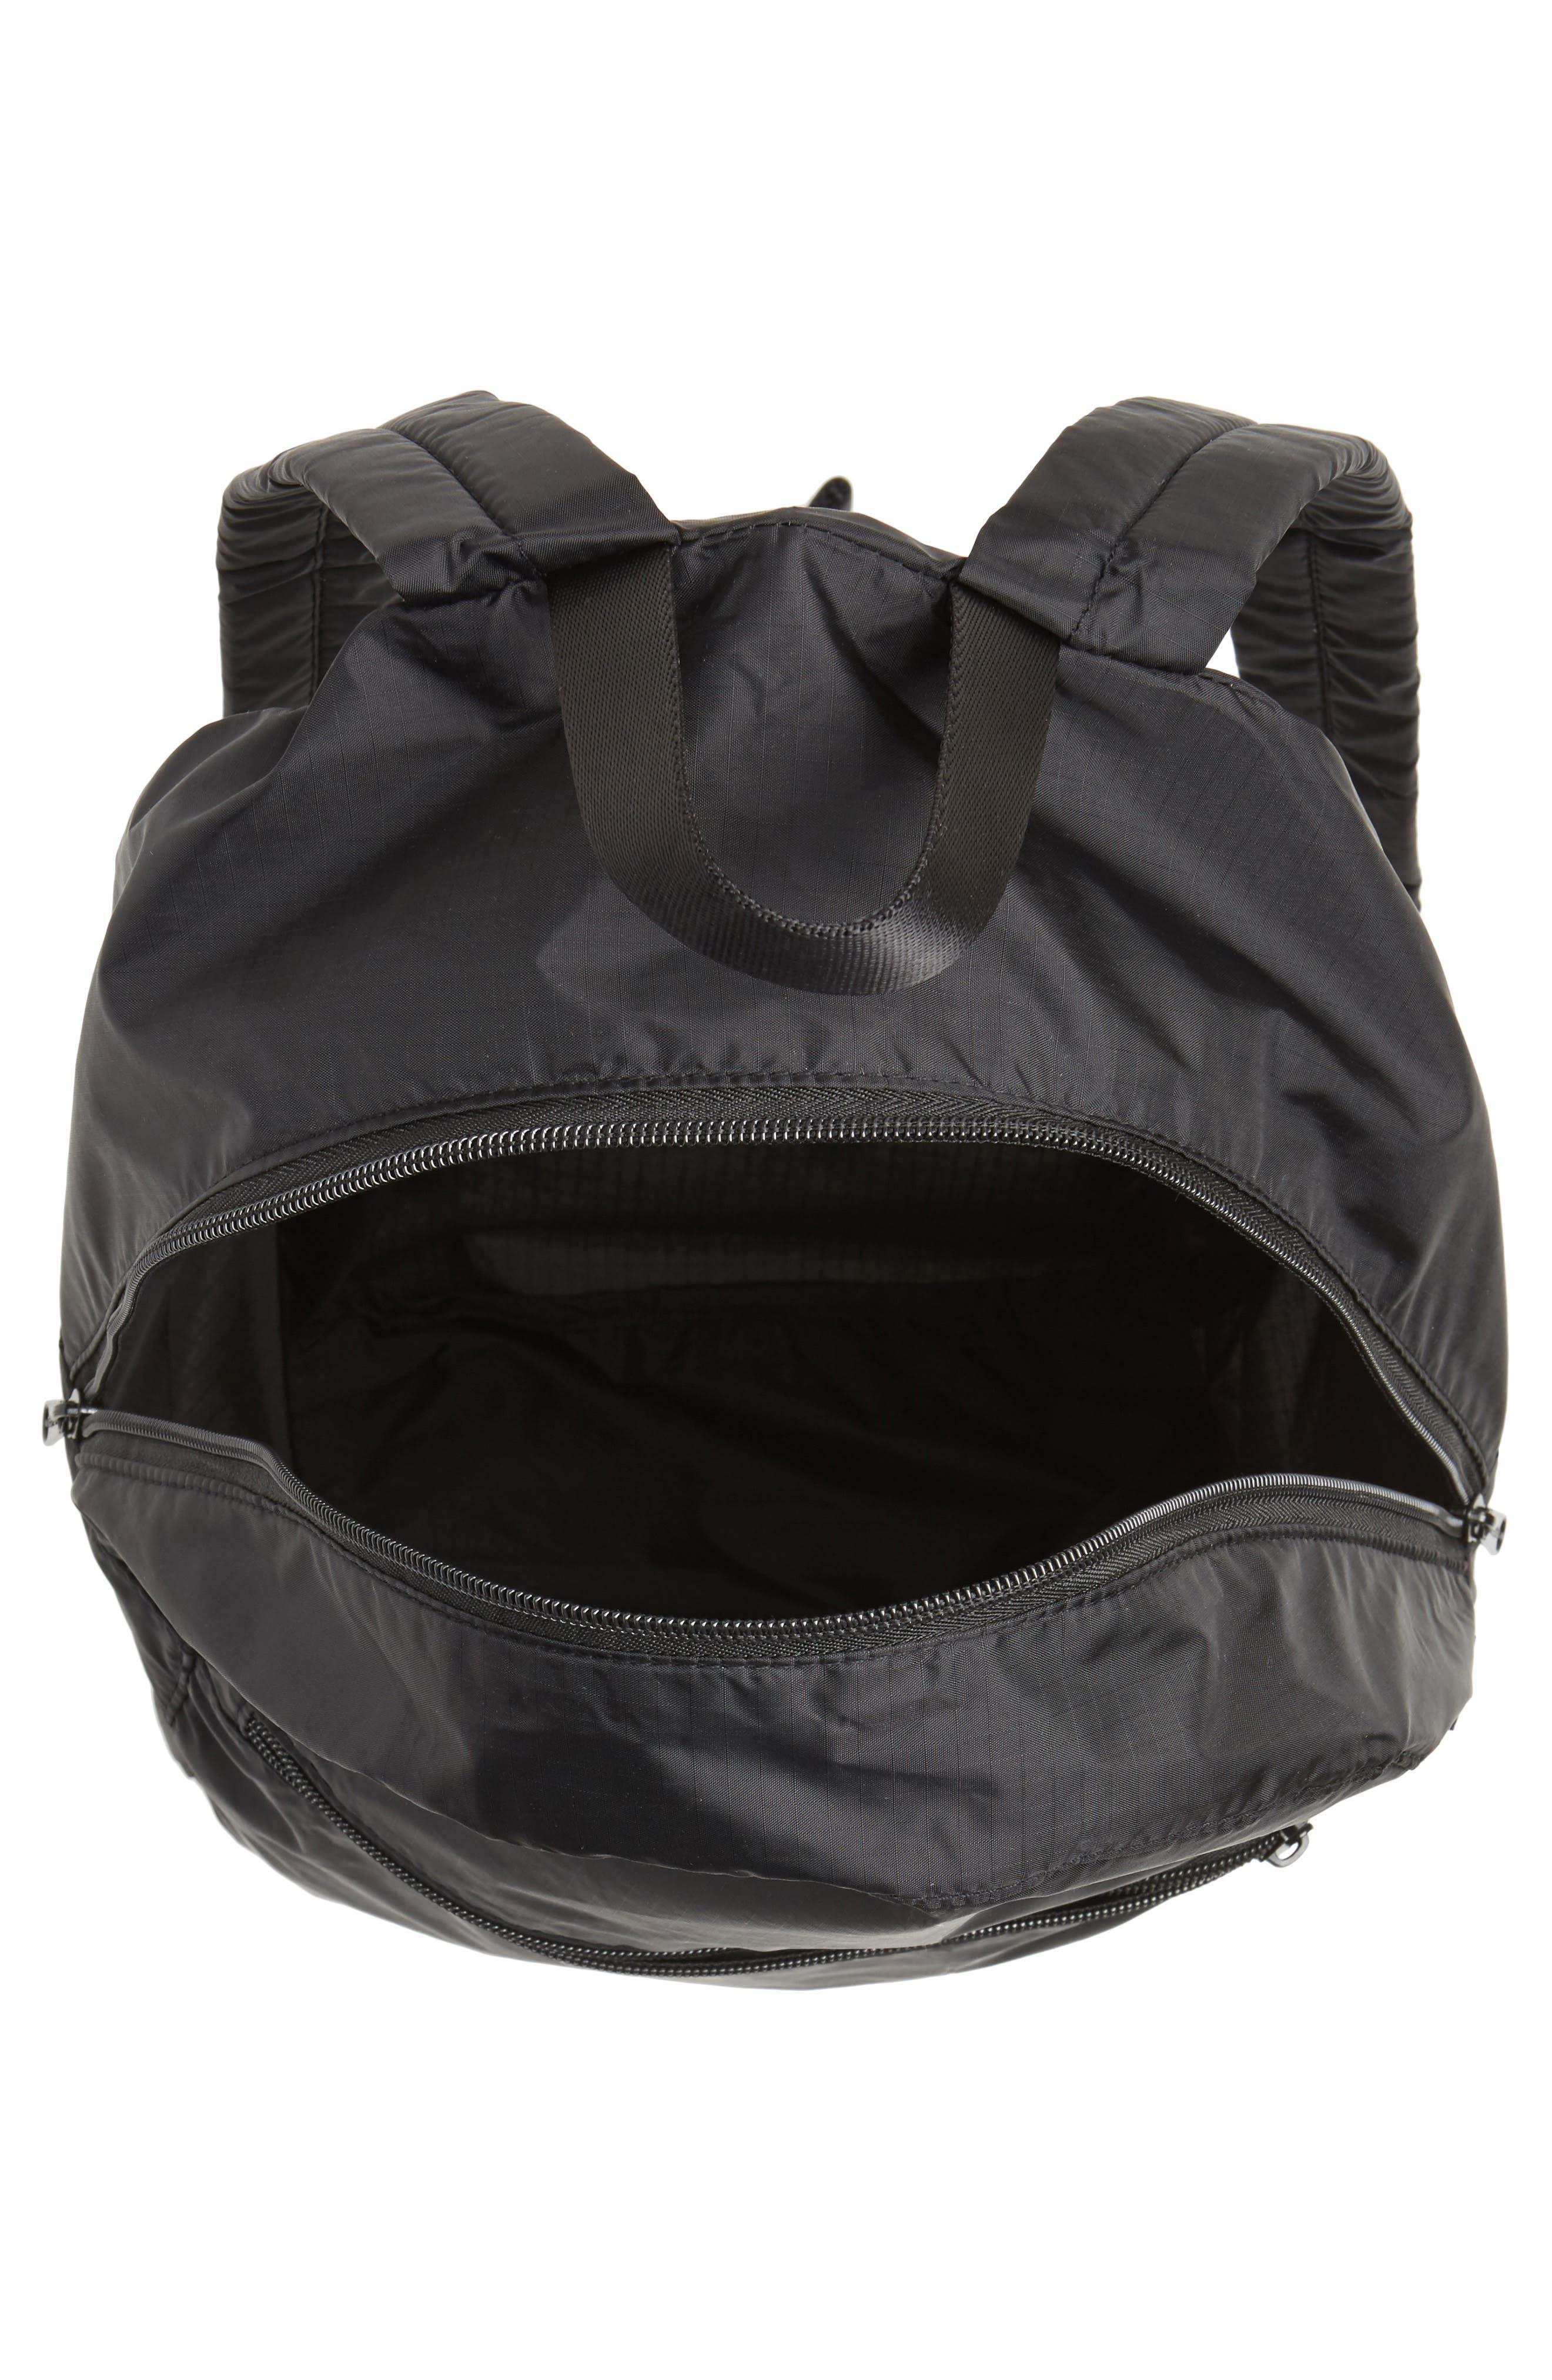 Ripstop Nylon Backpack,                             Alternate thumbnail 14, color,